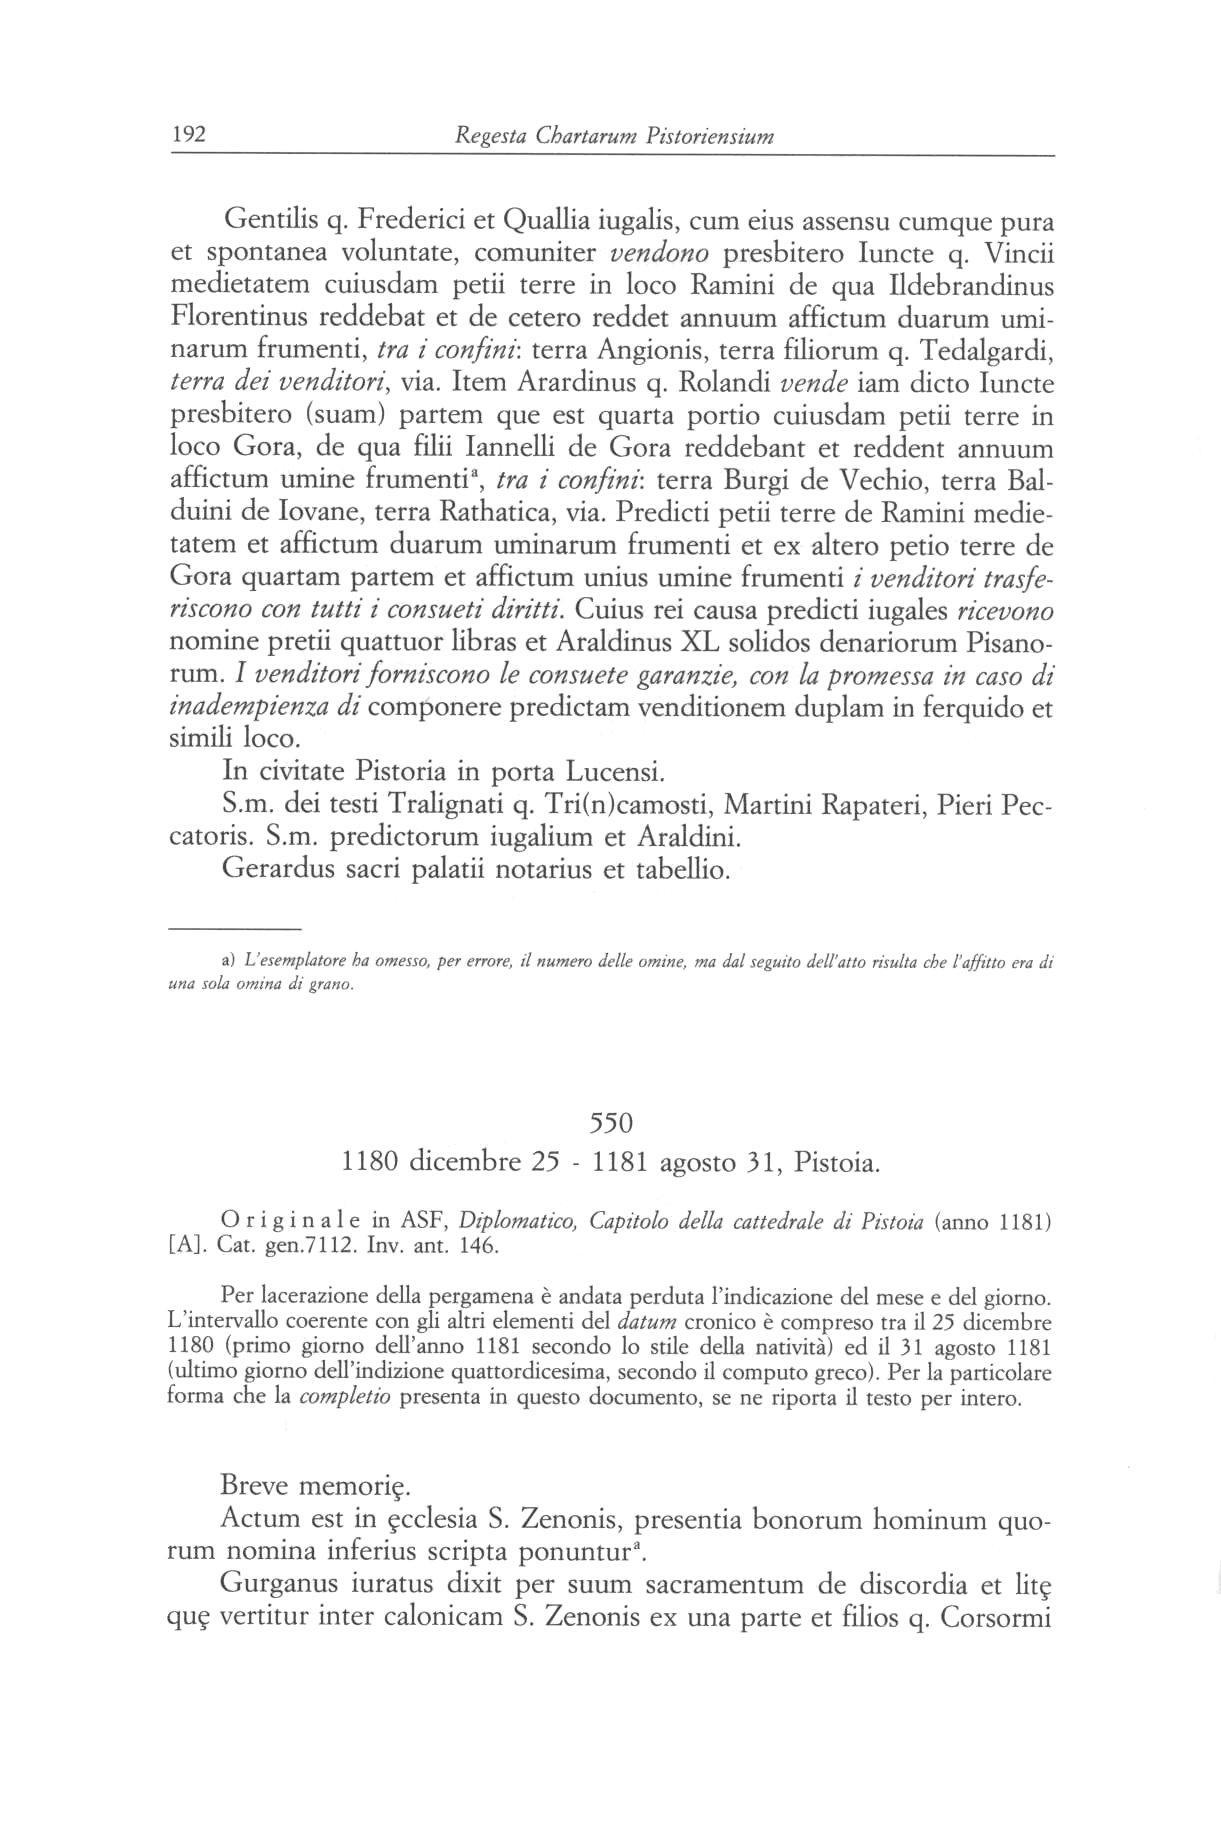 Canonica S. Zenone XII 0192.jpg